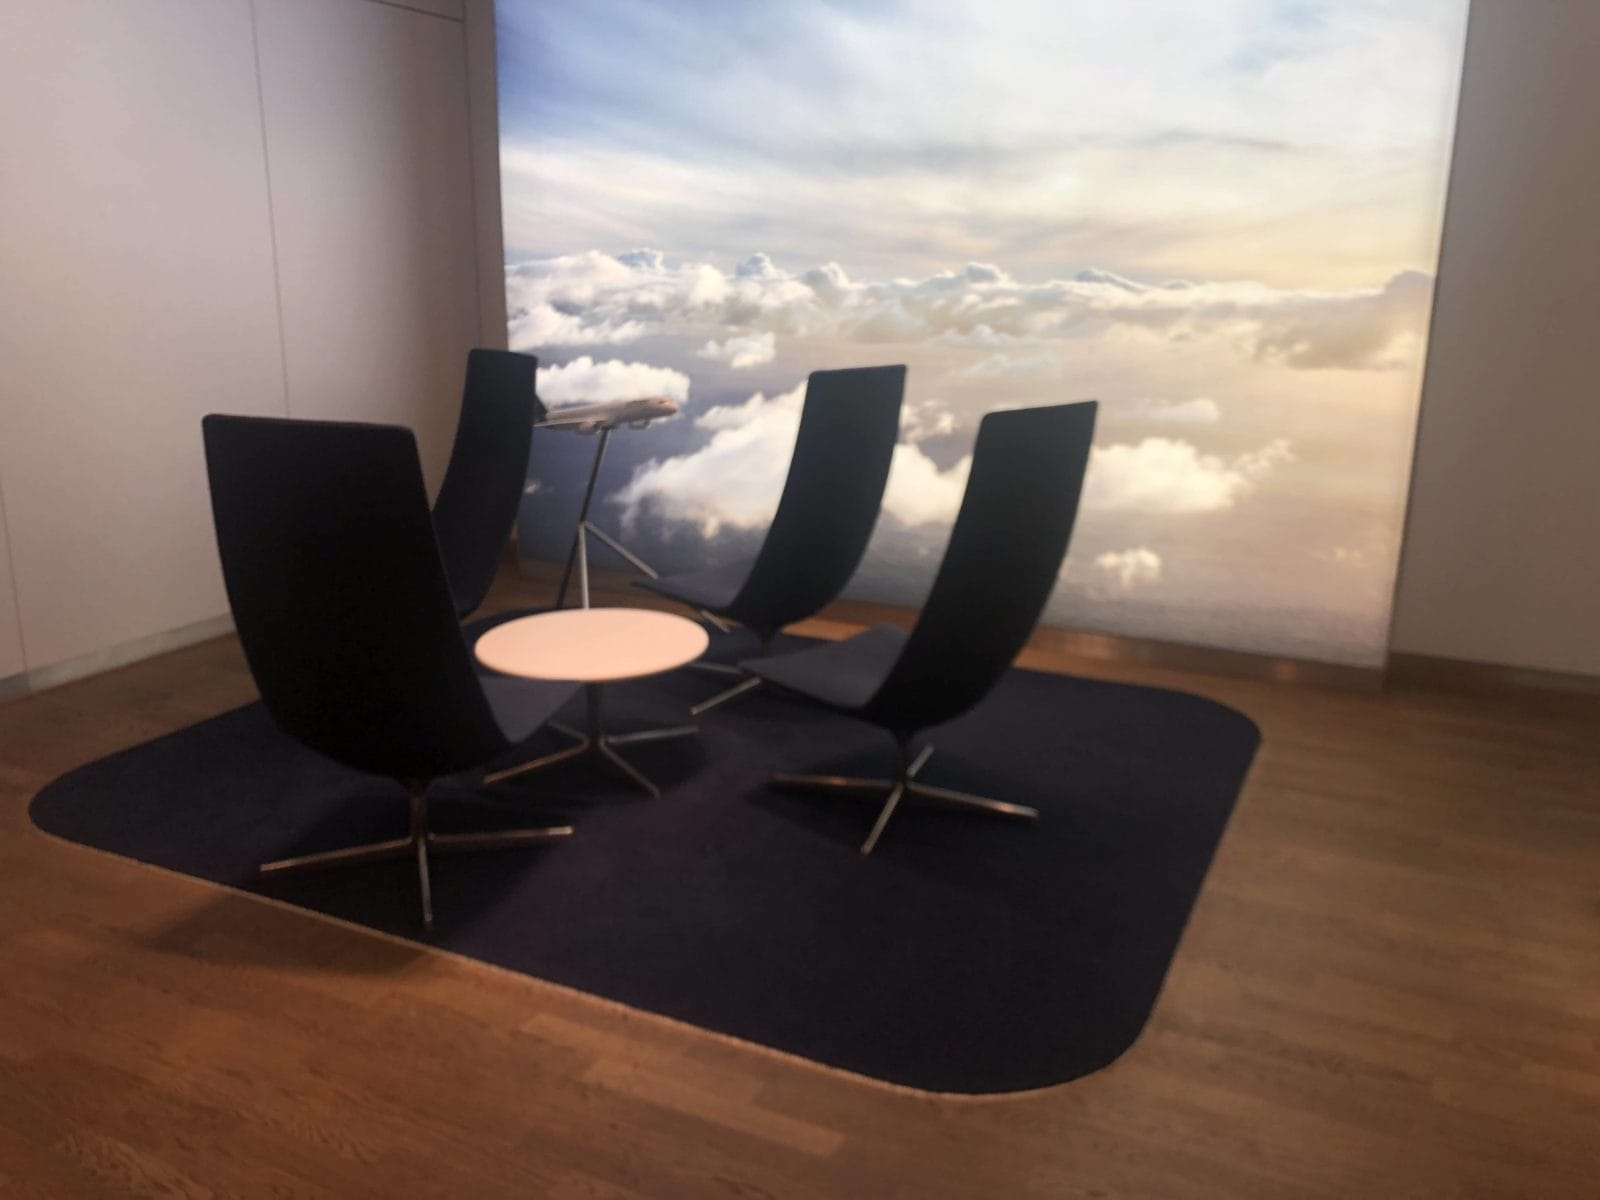 Lufthansa Senator Lounge Frankfurt A Sessel im Eingangsbereich